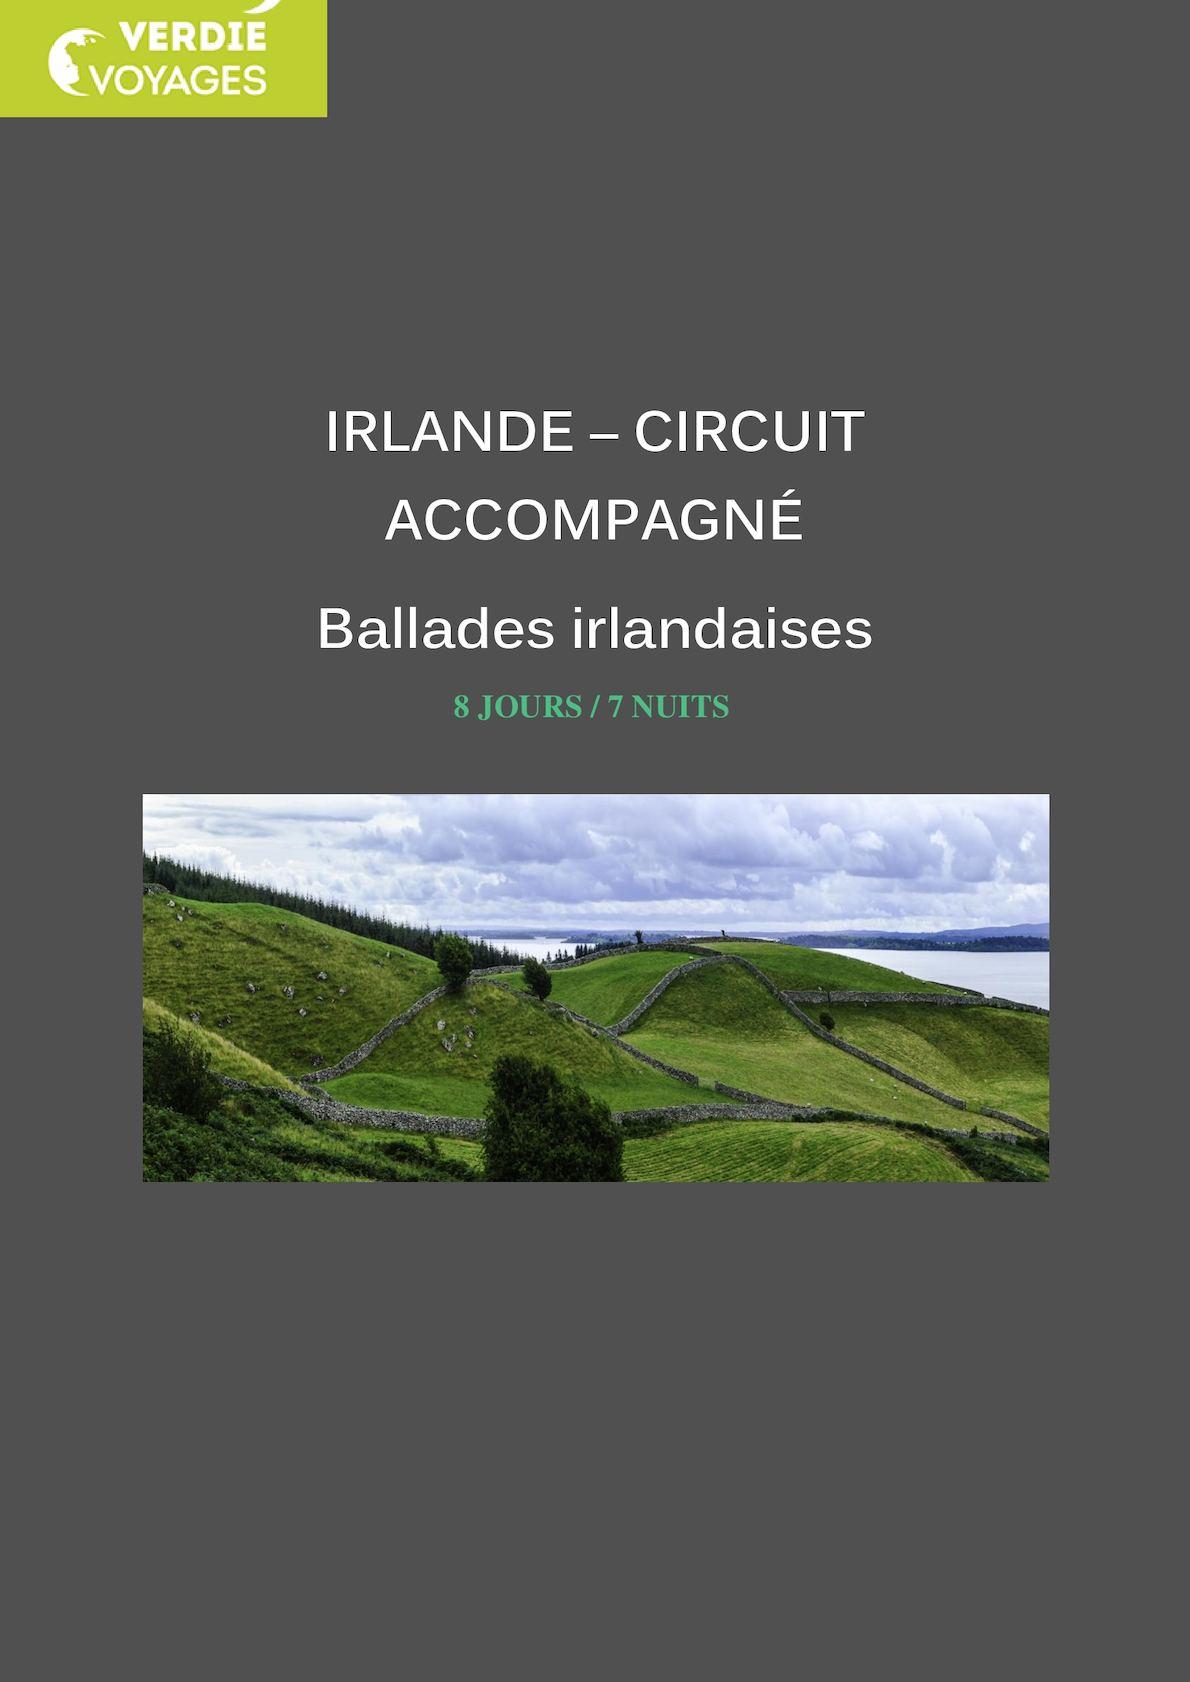 Brochure ballades irlandaises